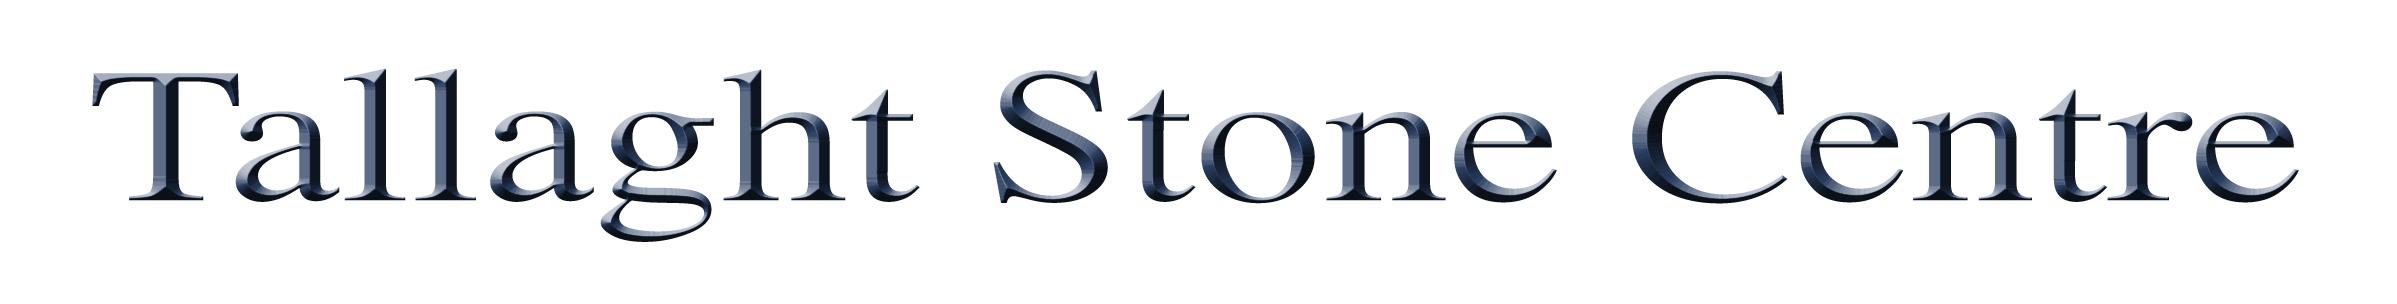 Tallaght Stone Center | Headstones Dublin